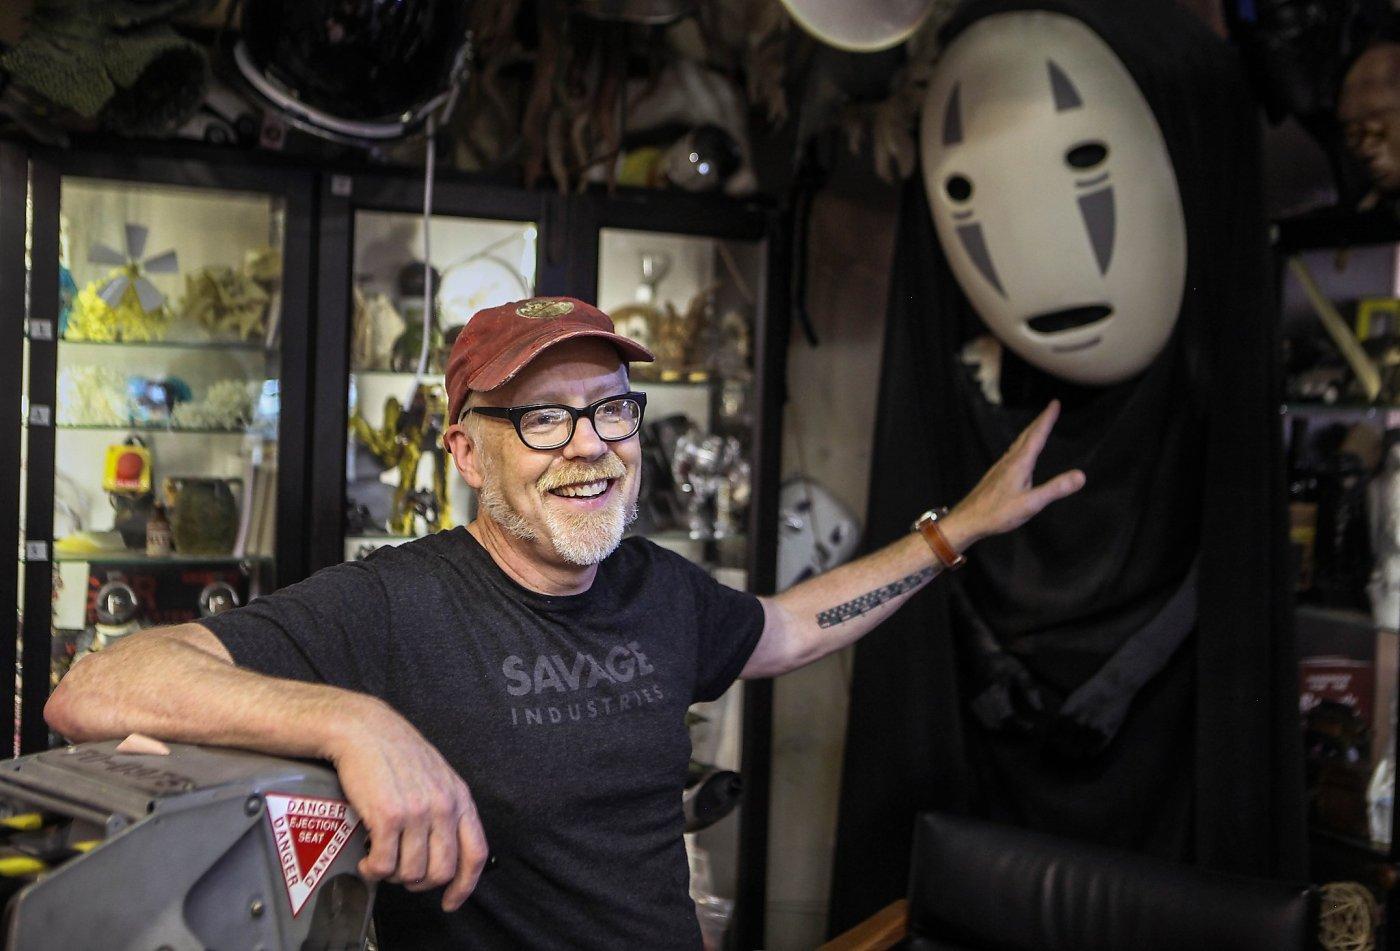 Peek inside Adam Savage's famed SF Comic-Con costume closet - SFGate